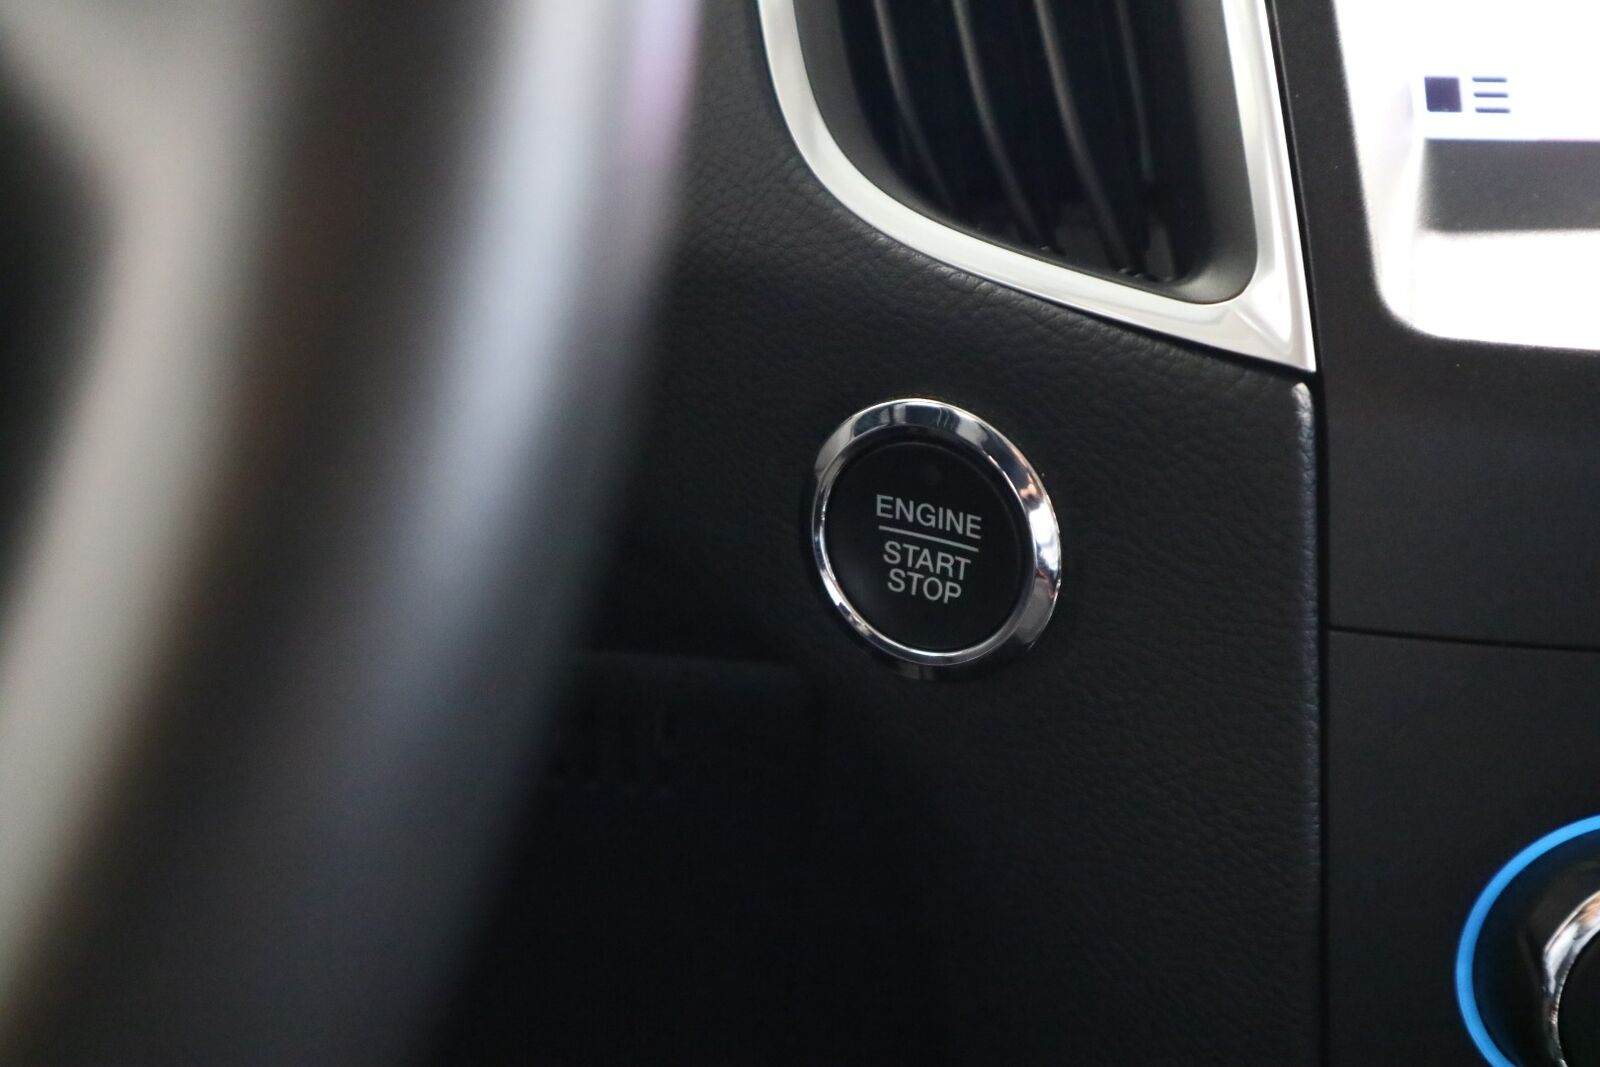 Ford Galaxy 2,0 TDCi 180 Titanium aut. - billede 5